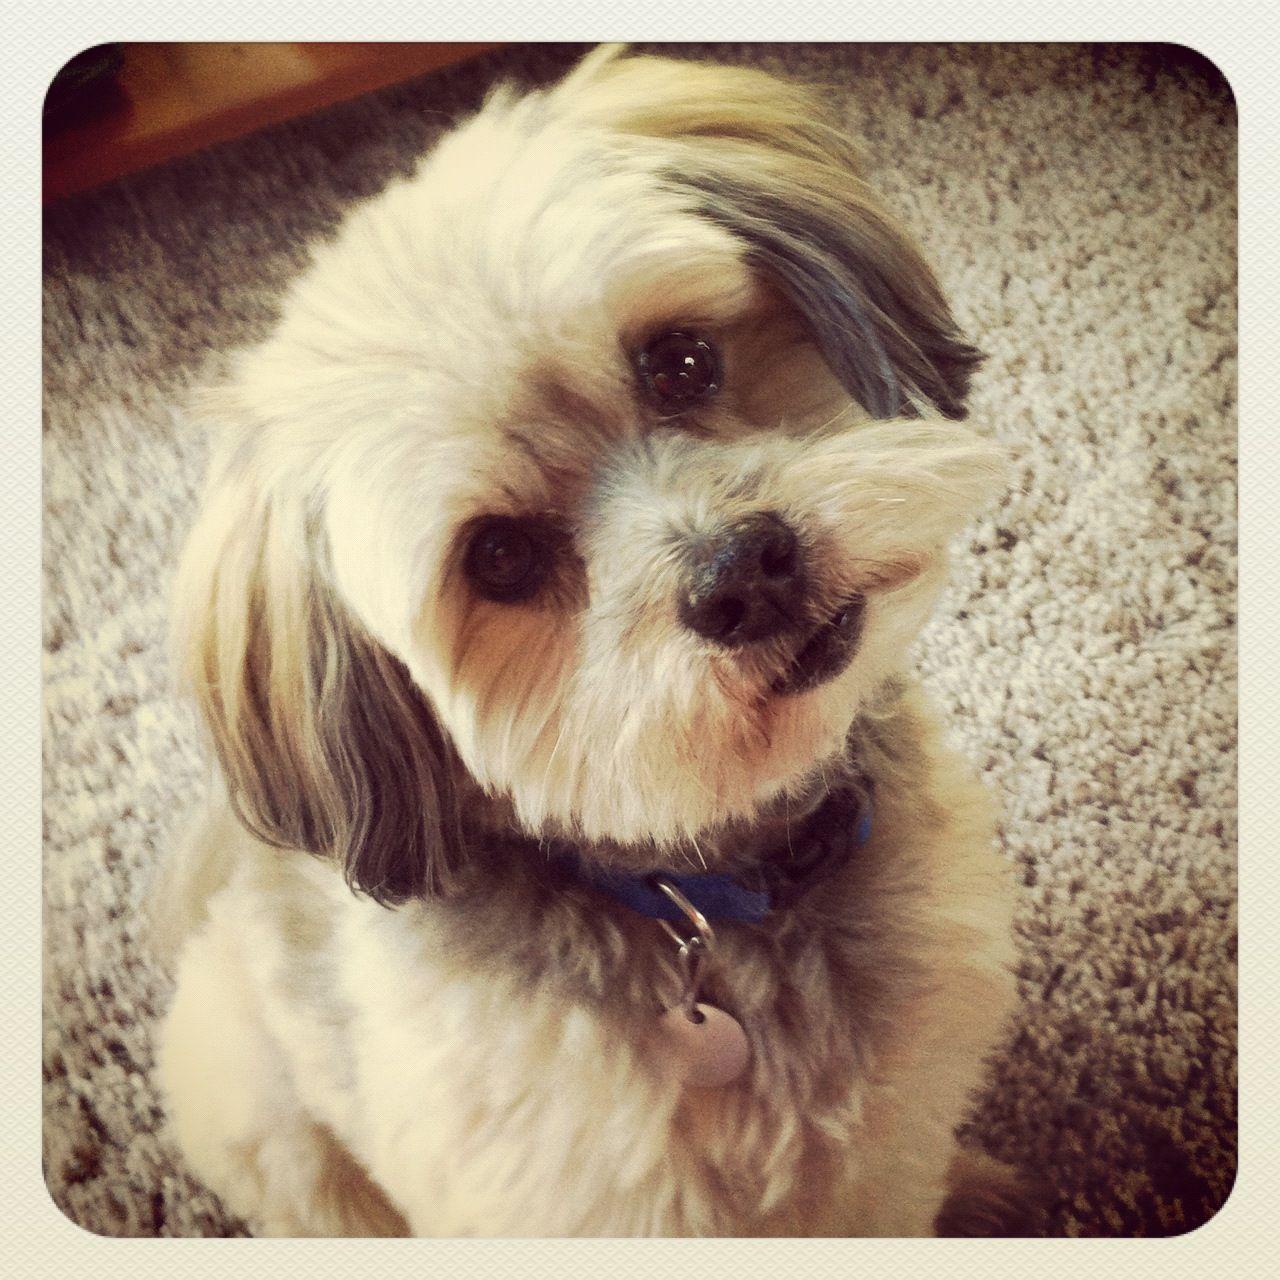 Cutest dog ever pomeranian shitzu poodle i love him